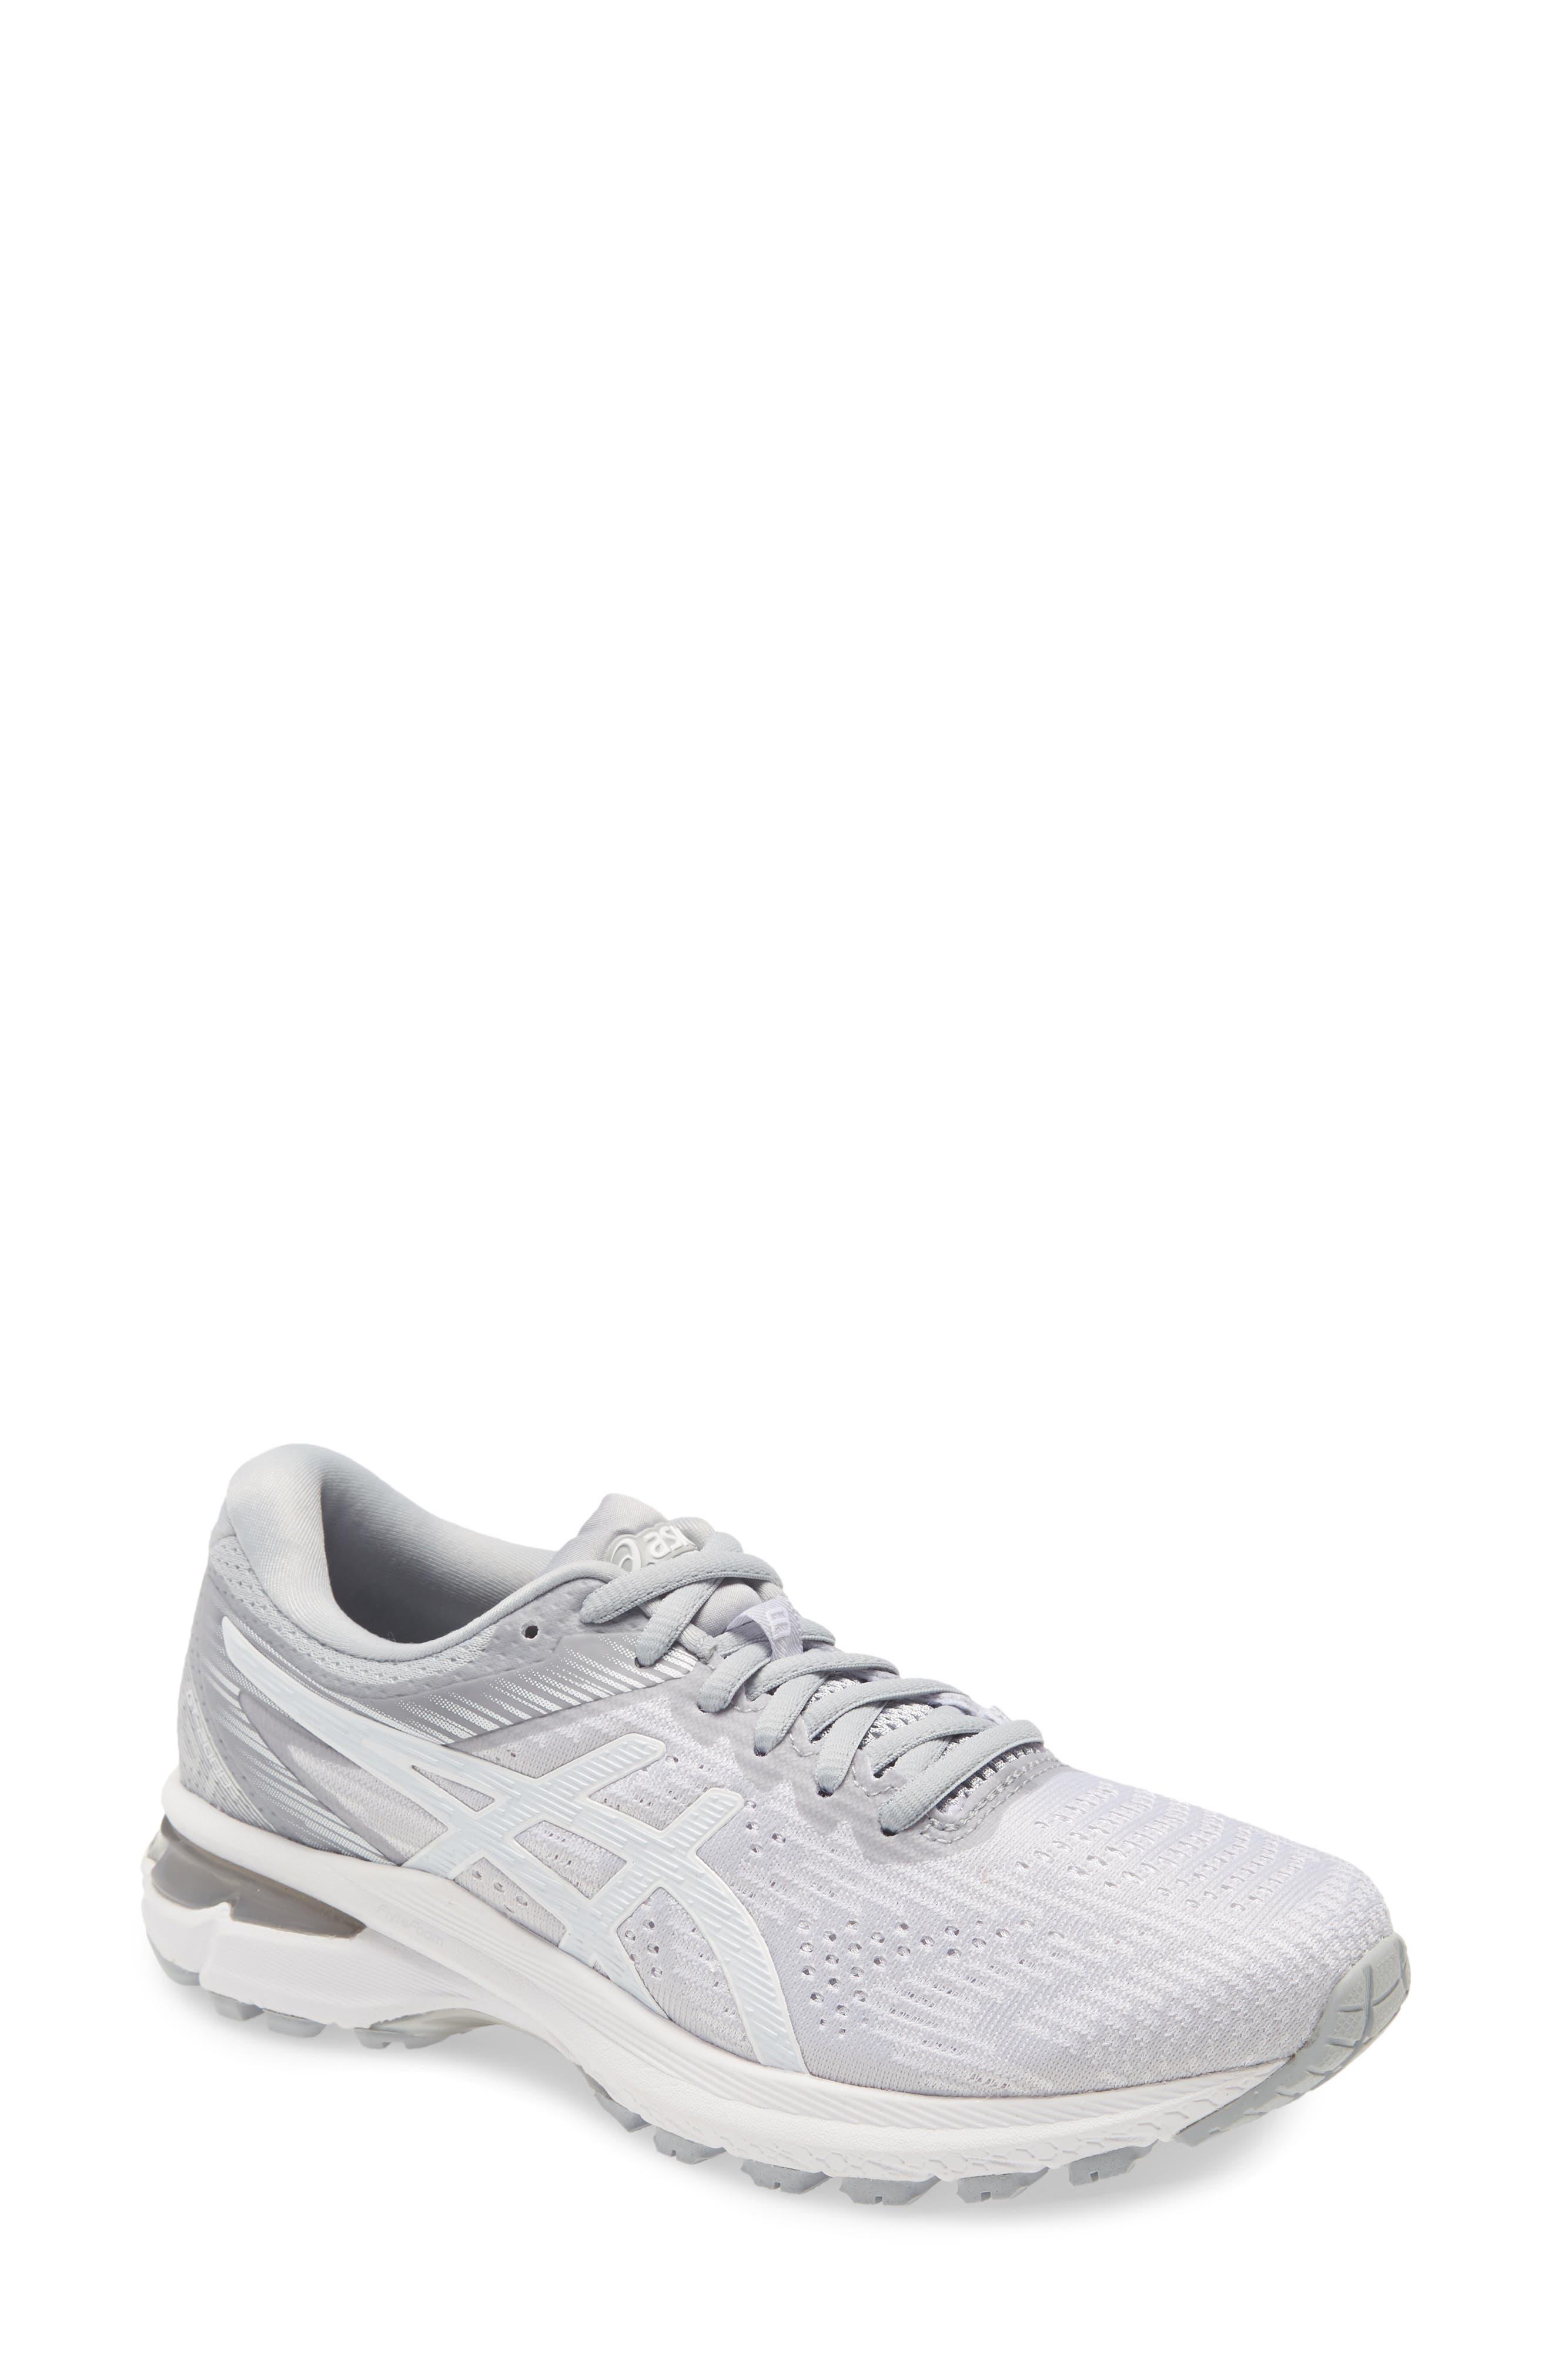 Image of ASICS GT-2000 8 Running Sneaker - Wide Width